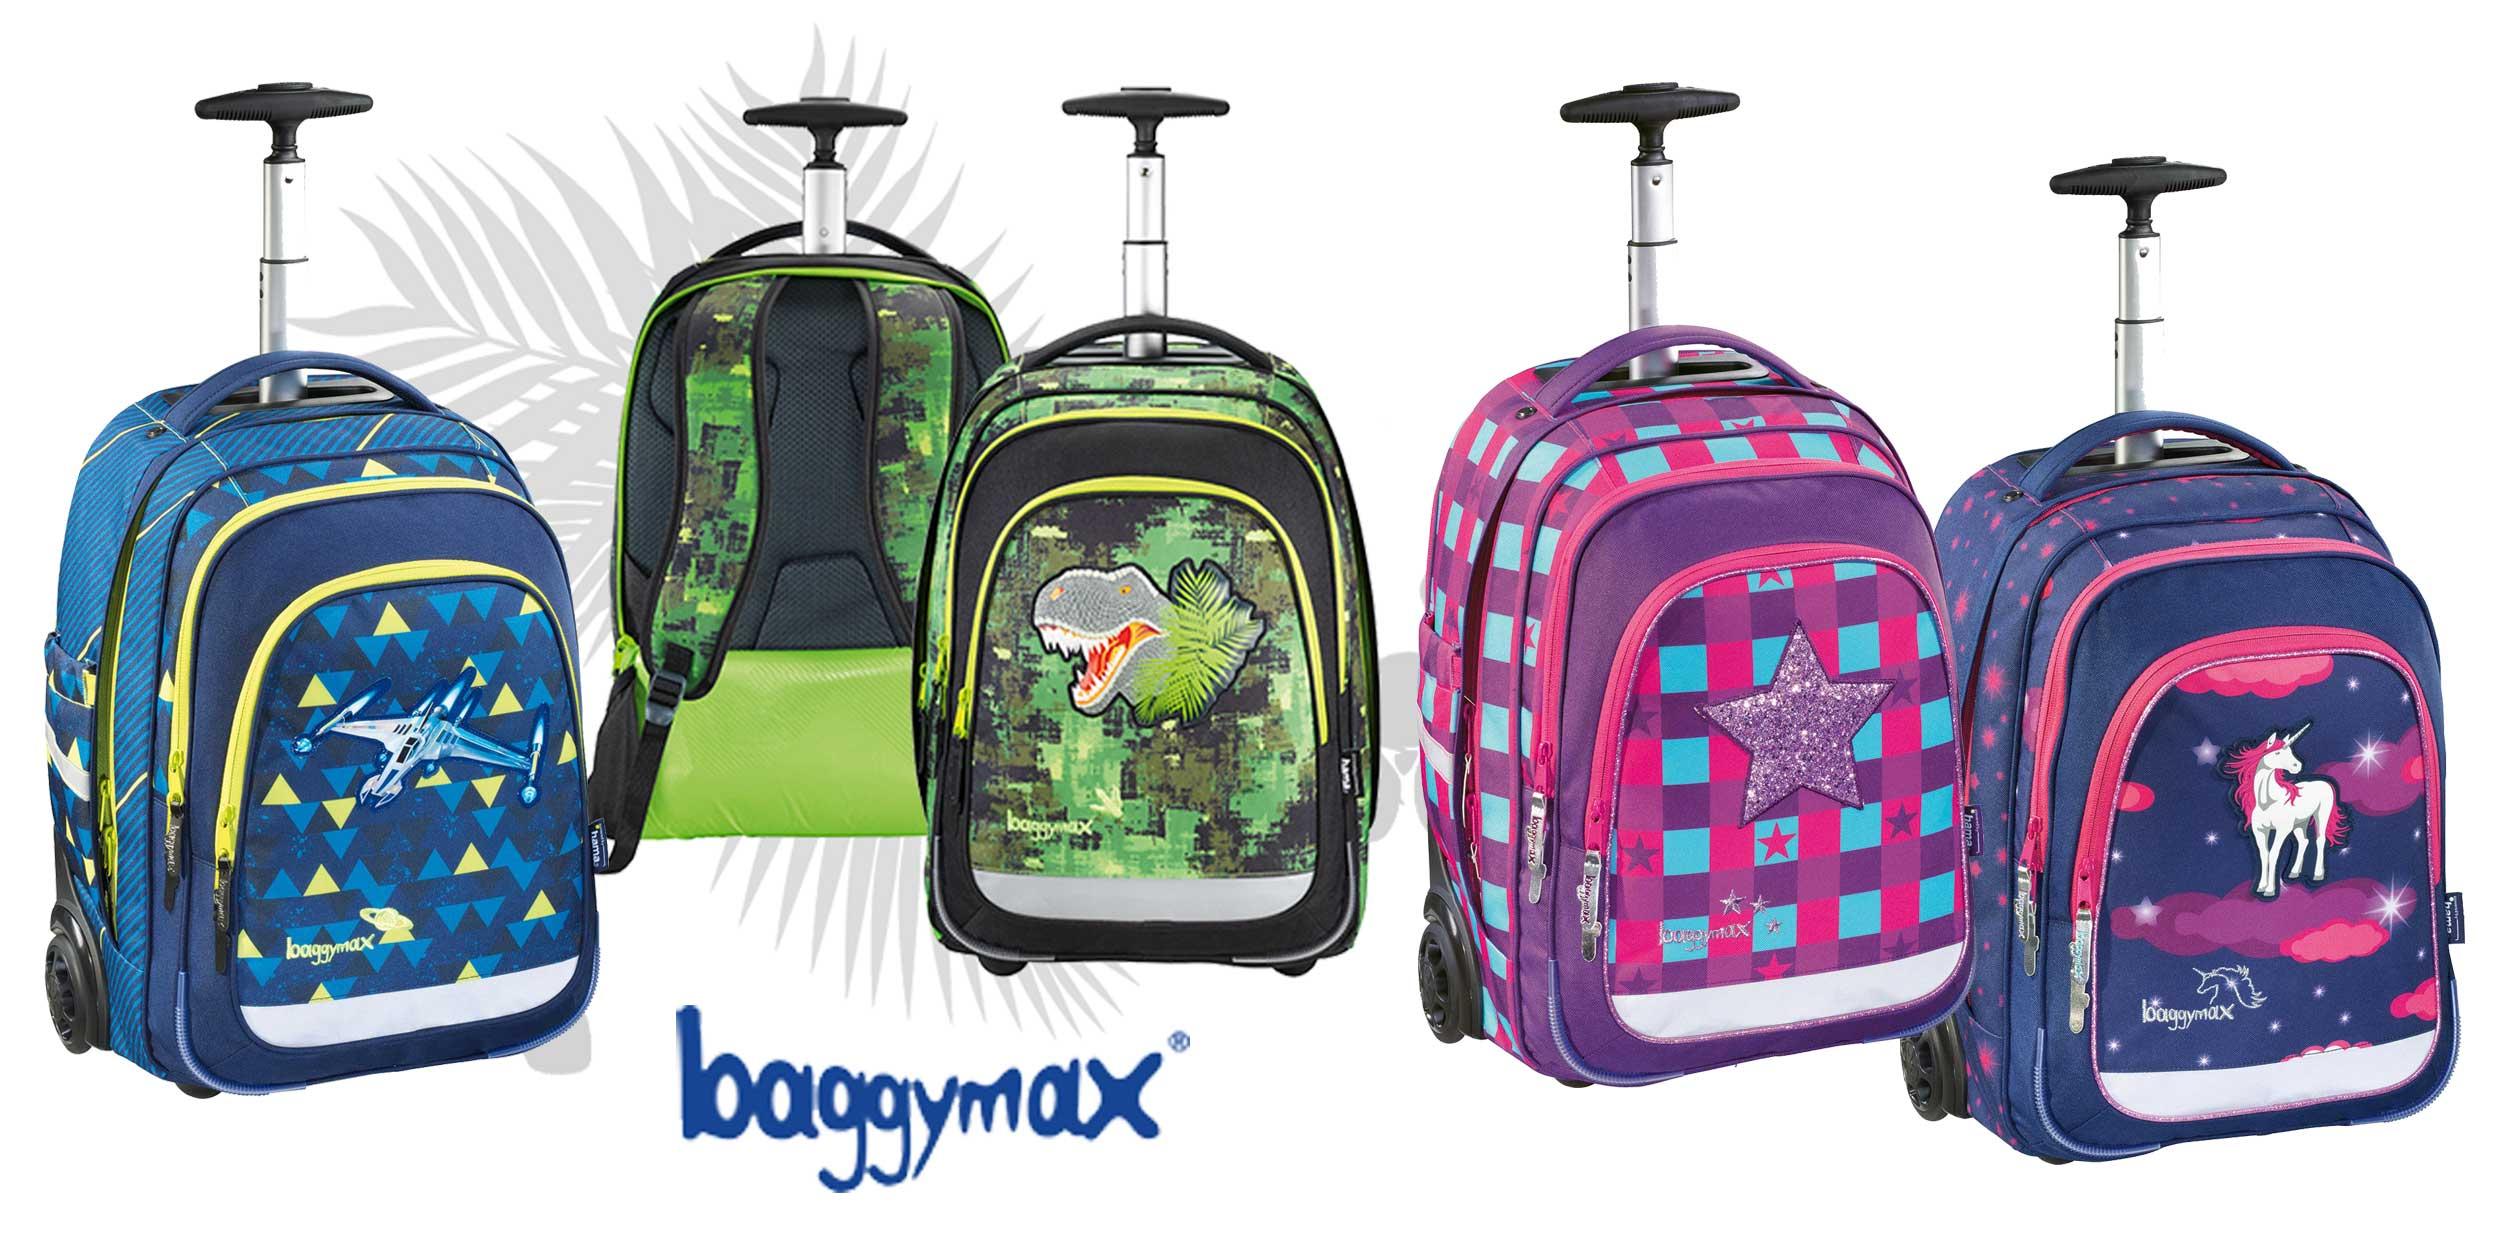 138e15e5e0533 Školské tašky do 30 eur online predaj eshop cena